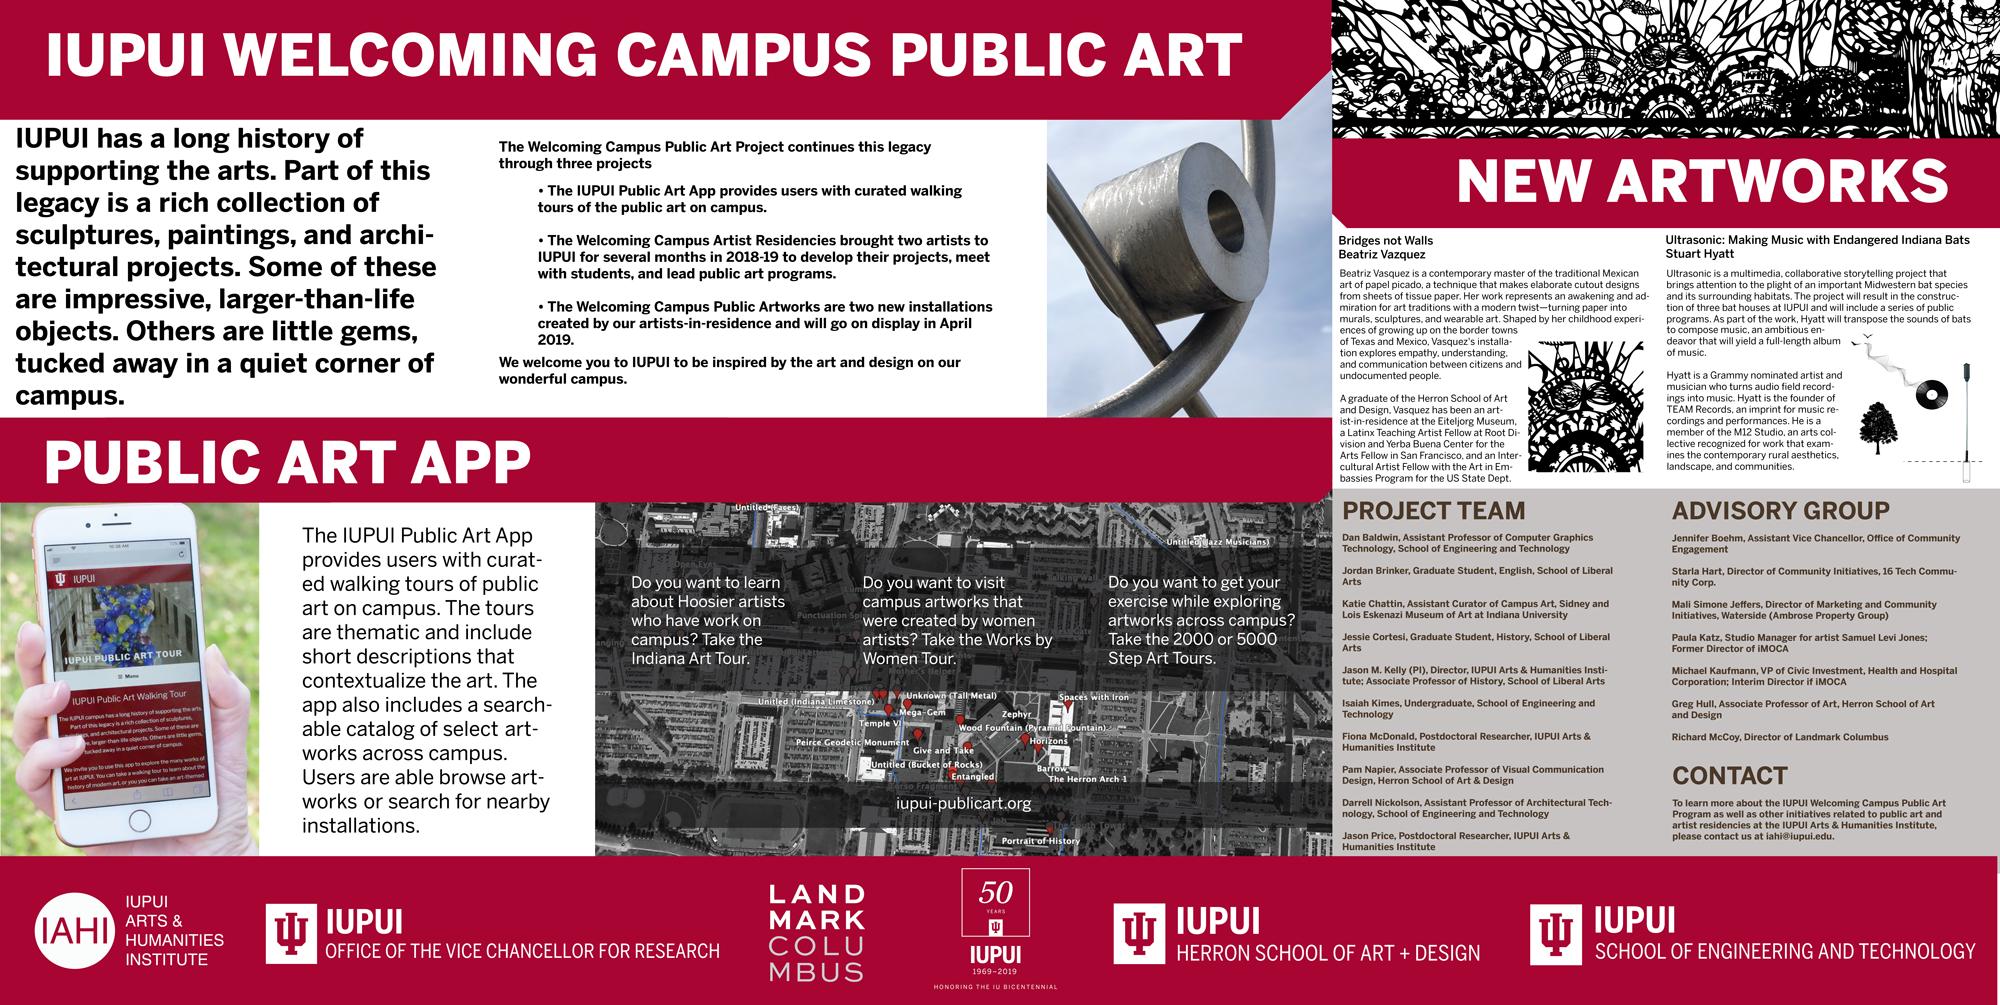 IUPUI Welcoming Campus Public Art Poster